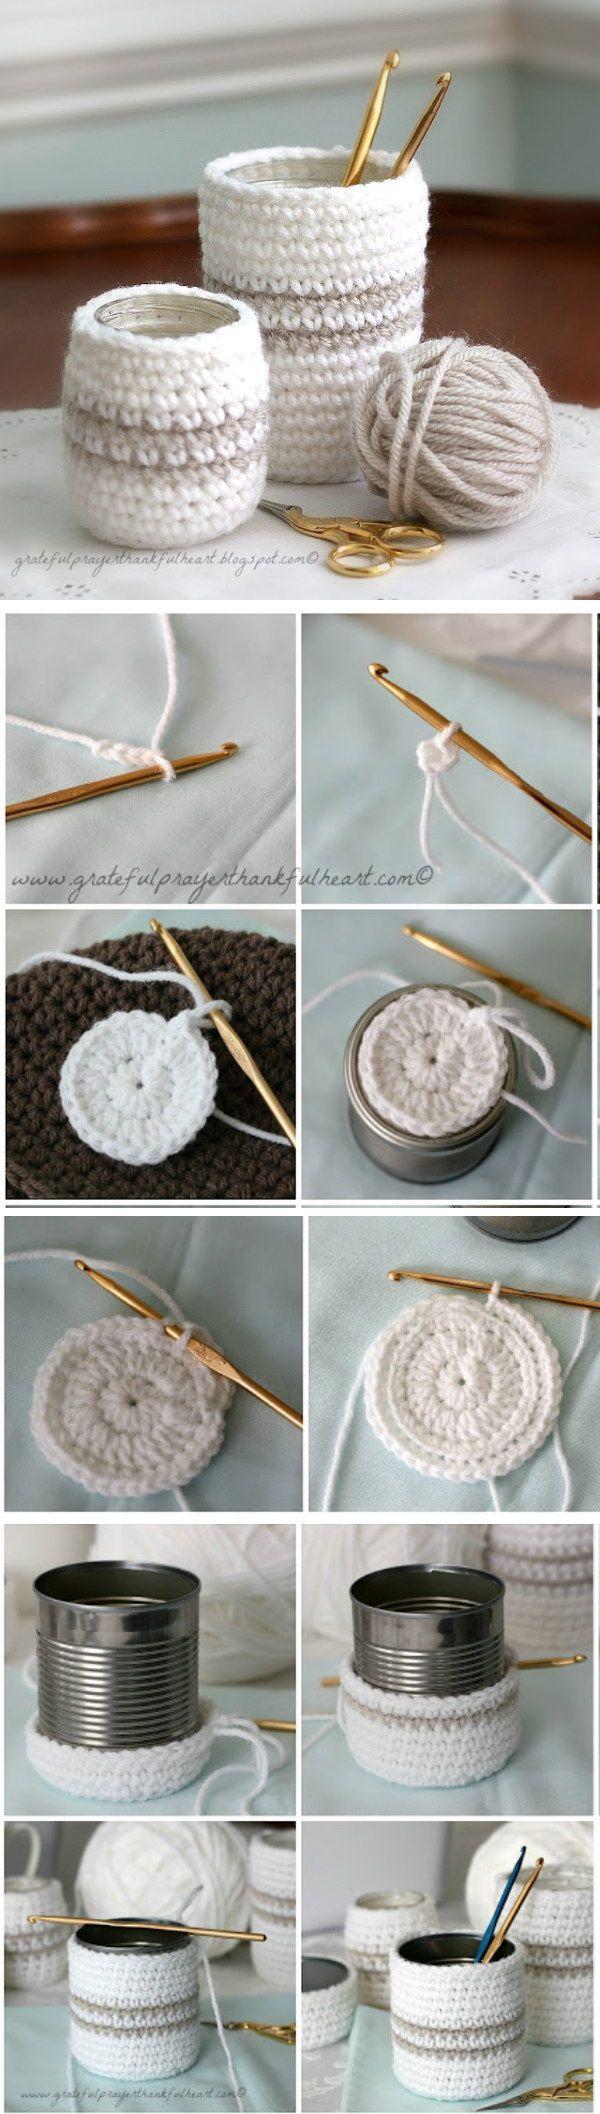 Crochet Cozy for Jars or Cans ❥ 4U hilariafina  http://www.pinterest.com/hilariafina/